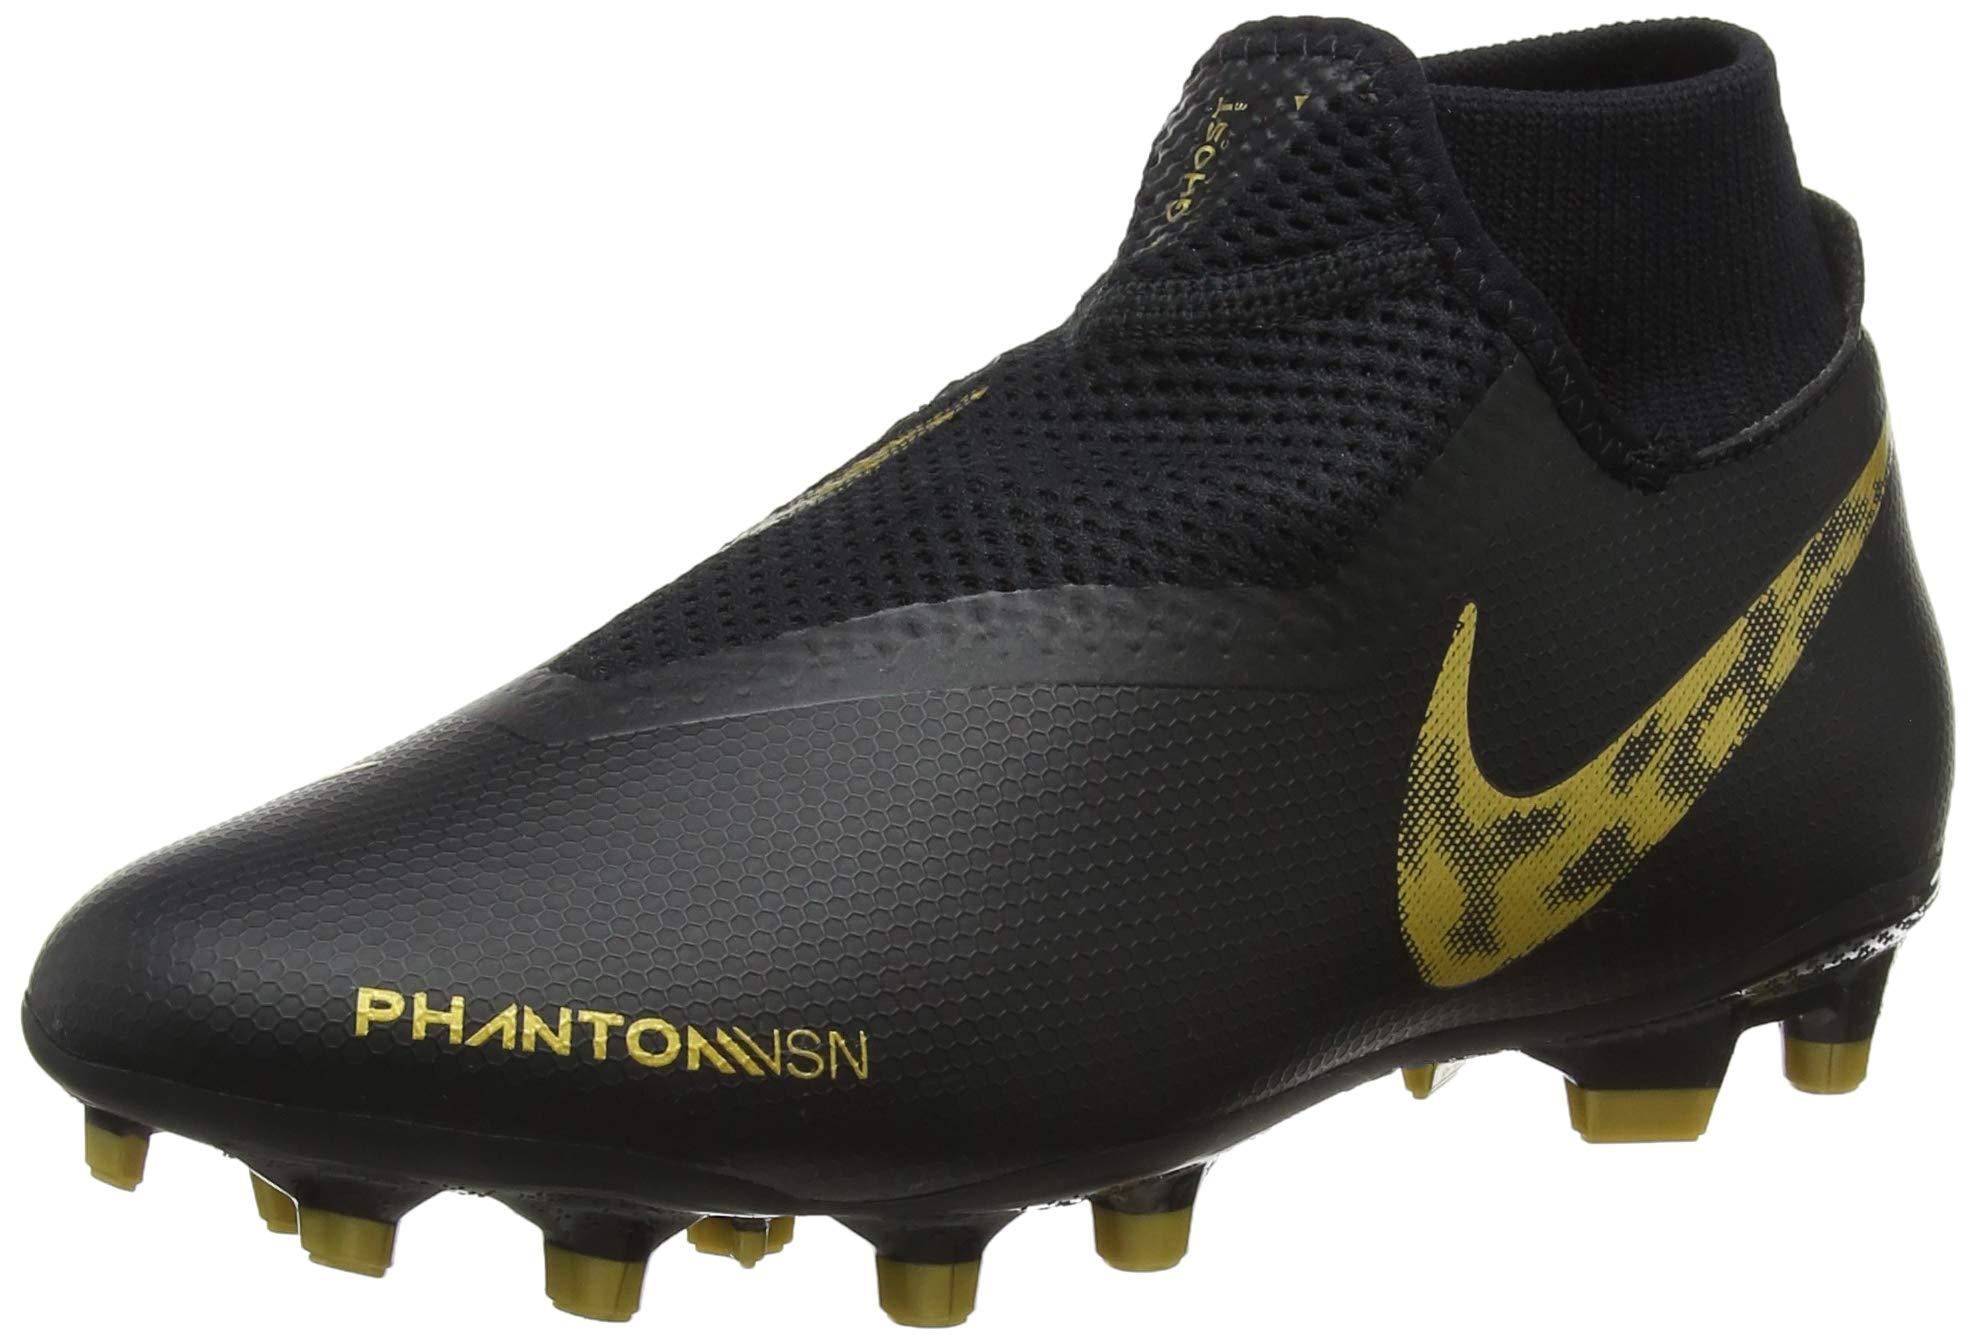 Nike Phantom VSN Academy DF FG/MG-Black-Gold 6.5